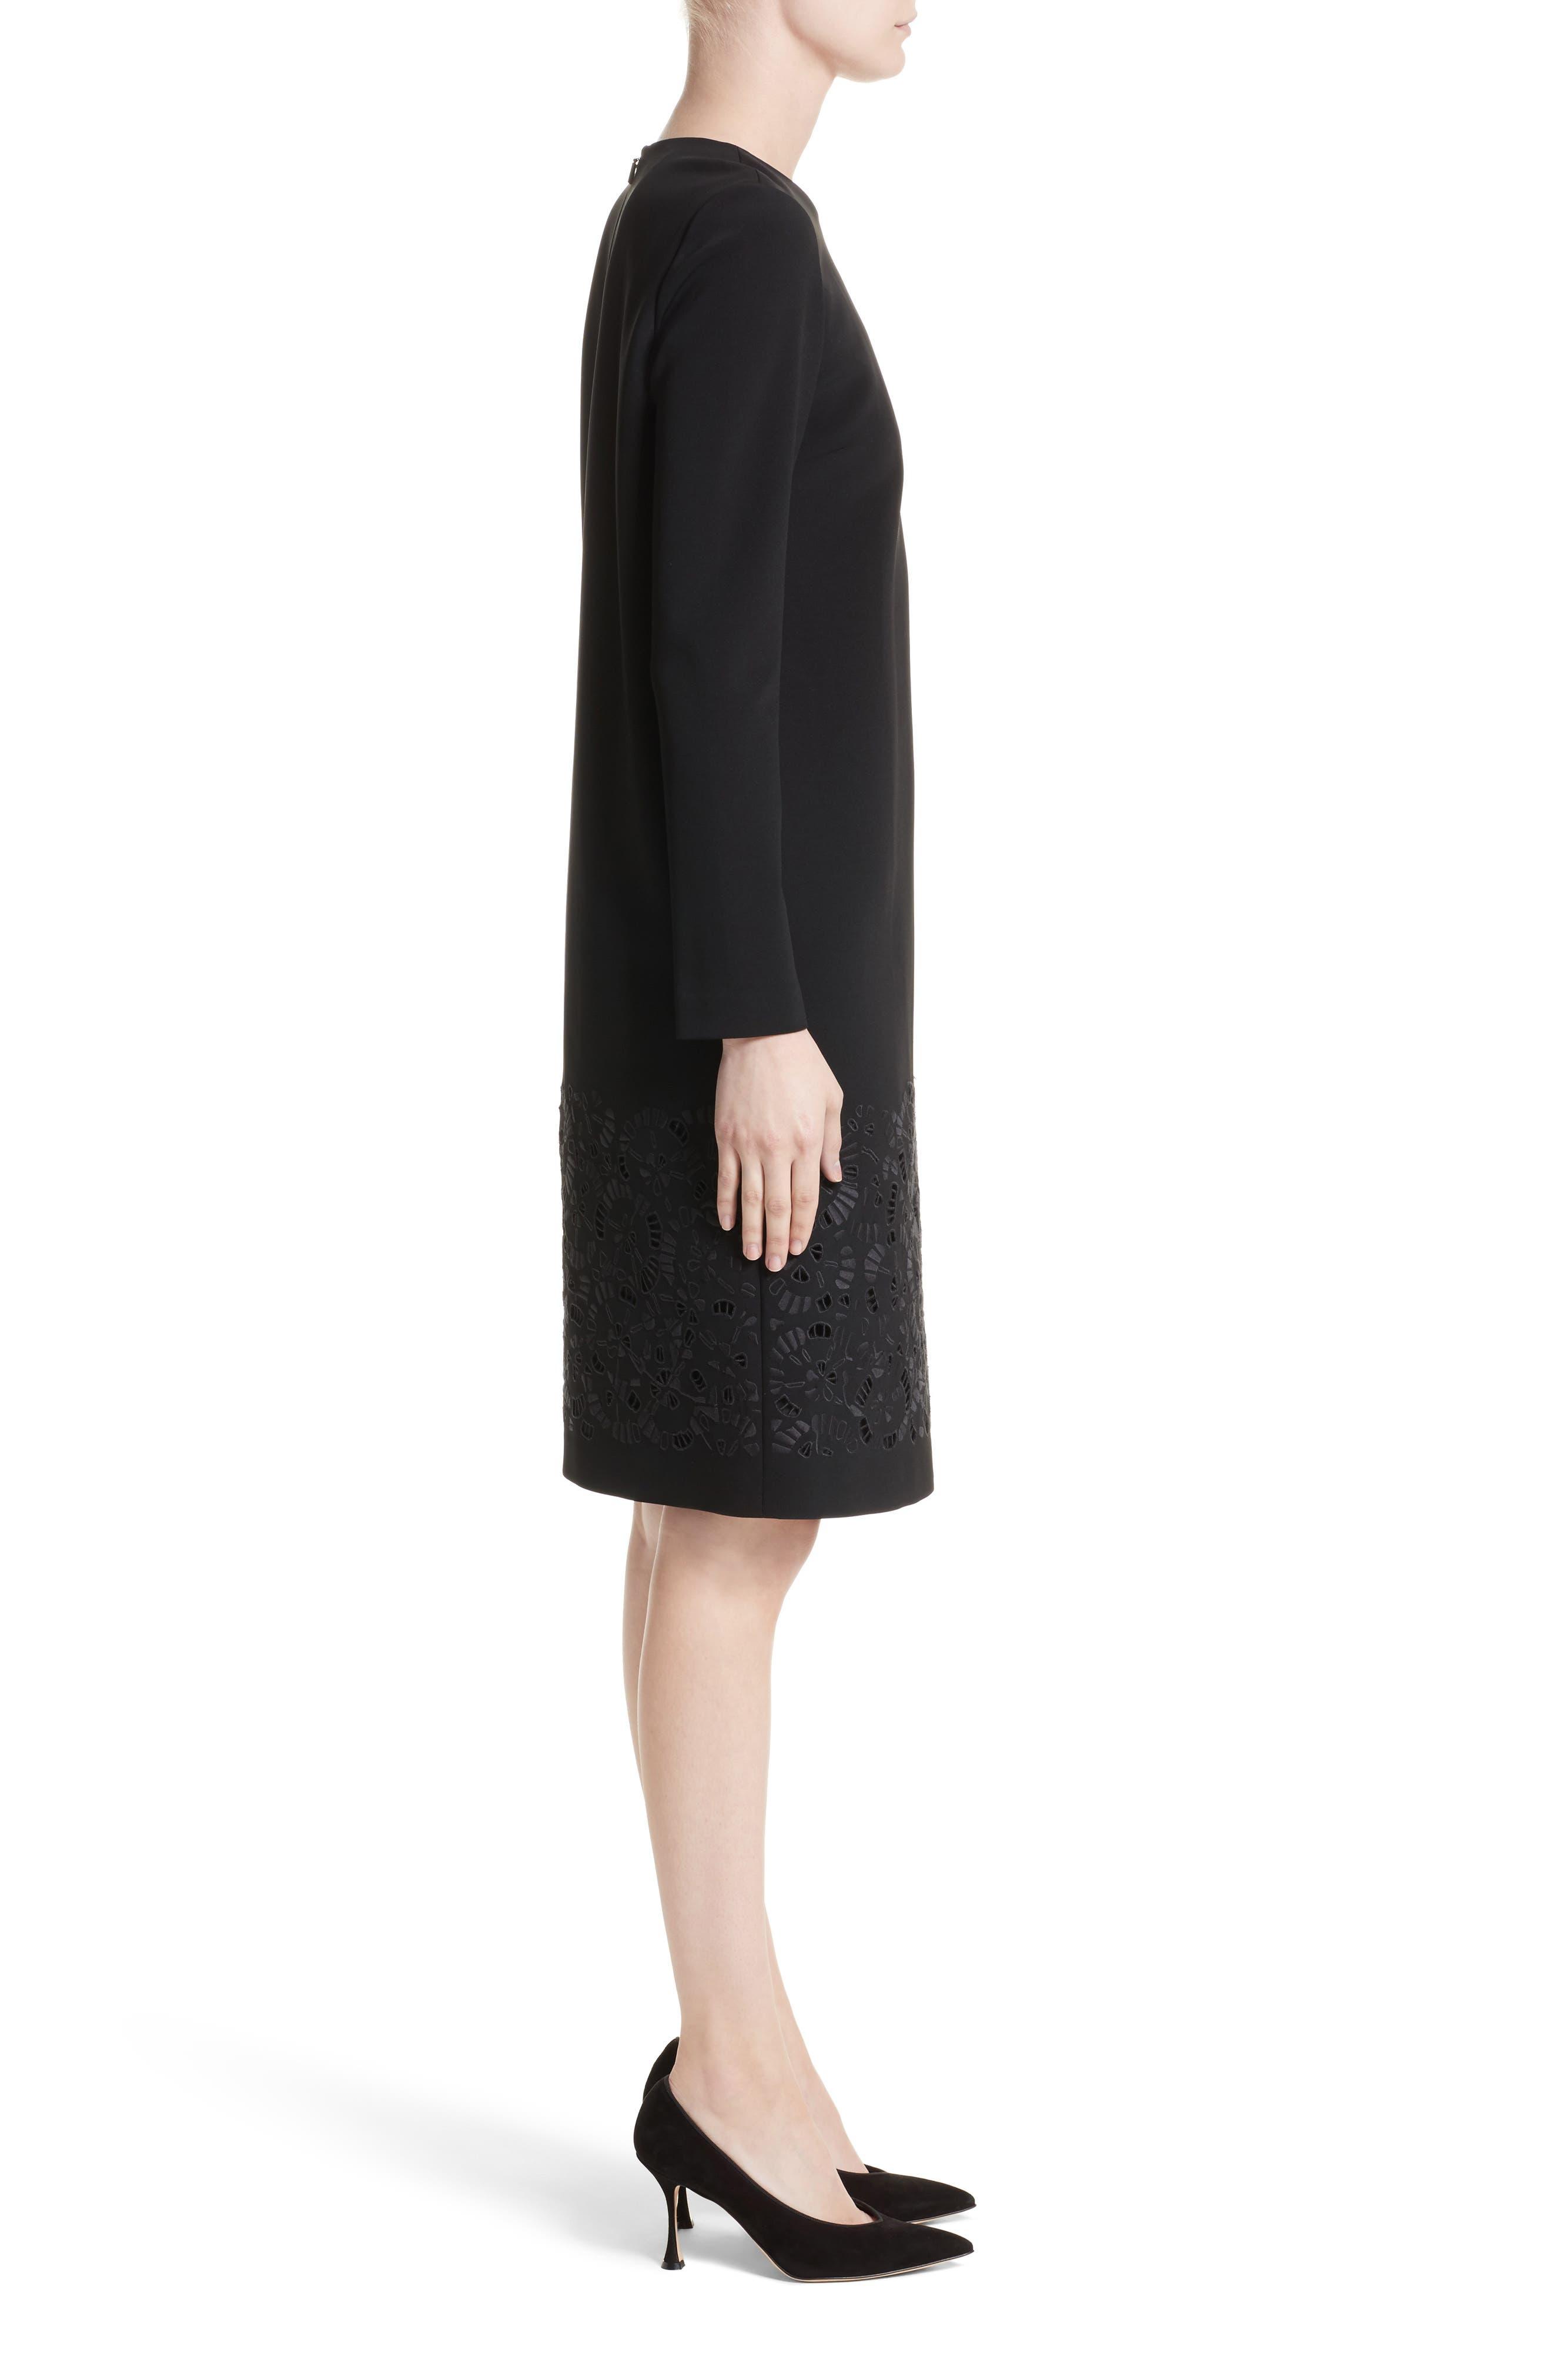 Corbin Embroidered Laser Cut Dress,                             Alternate thumbnail 3, color,                             Black